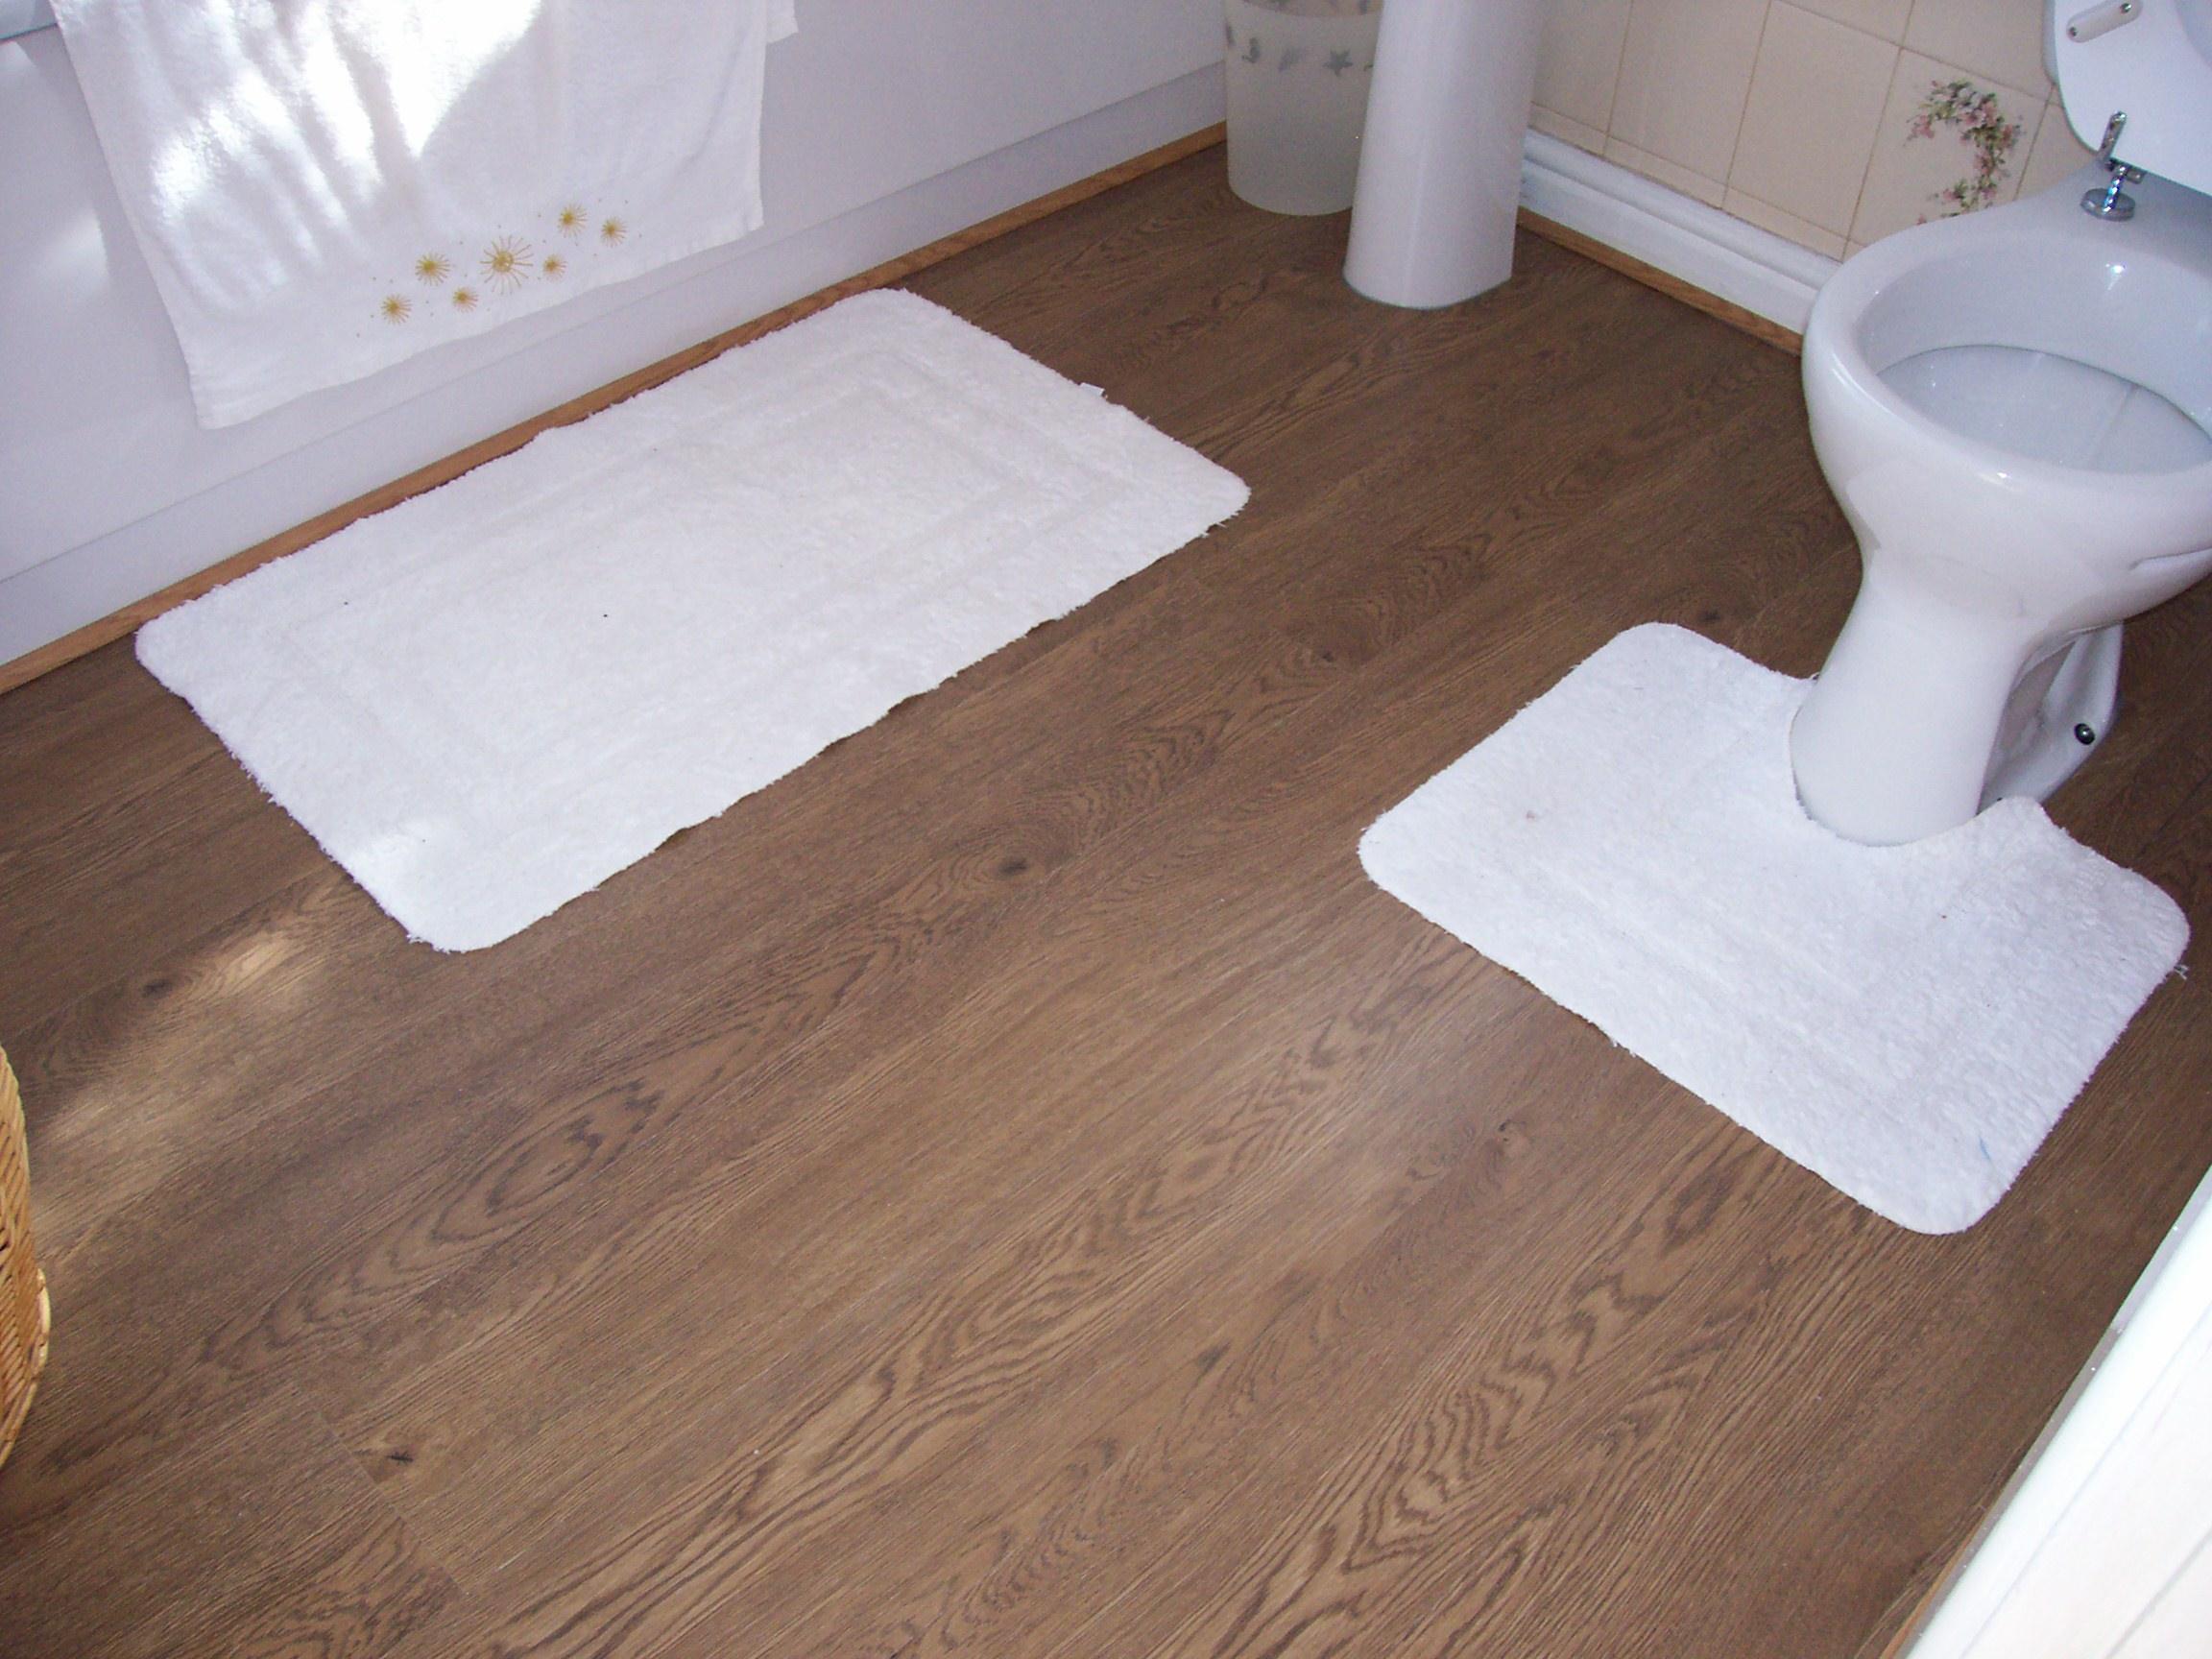 Laminate floors in bathroom